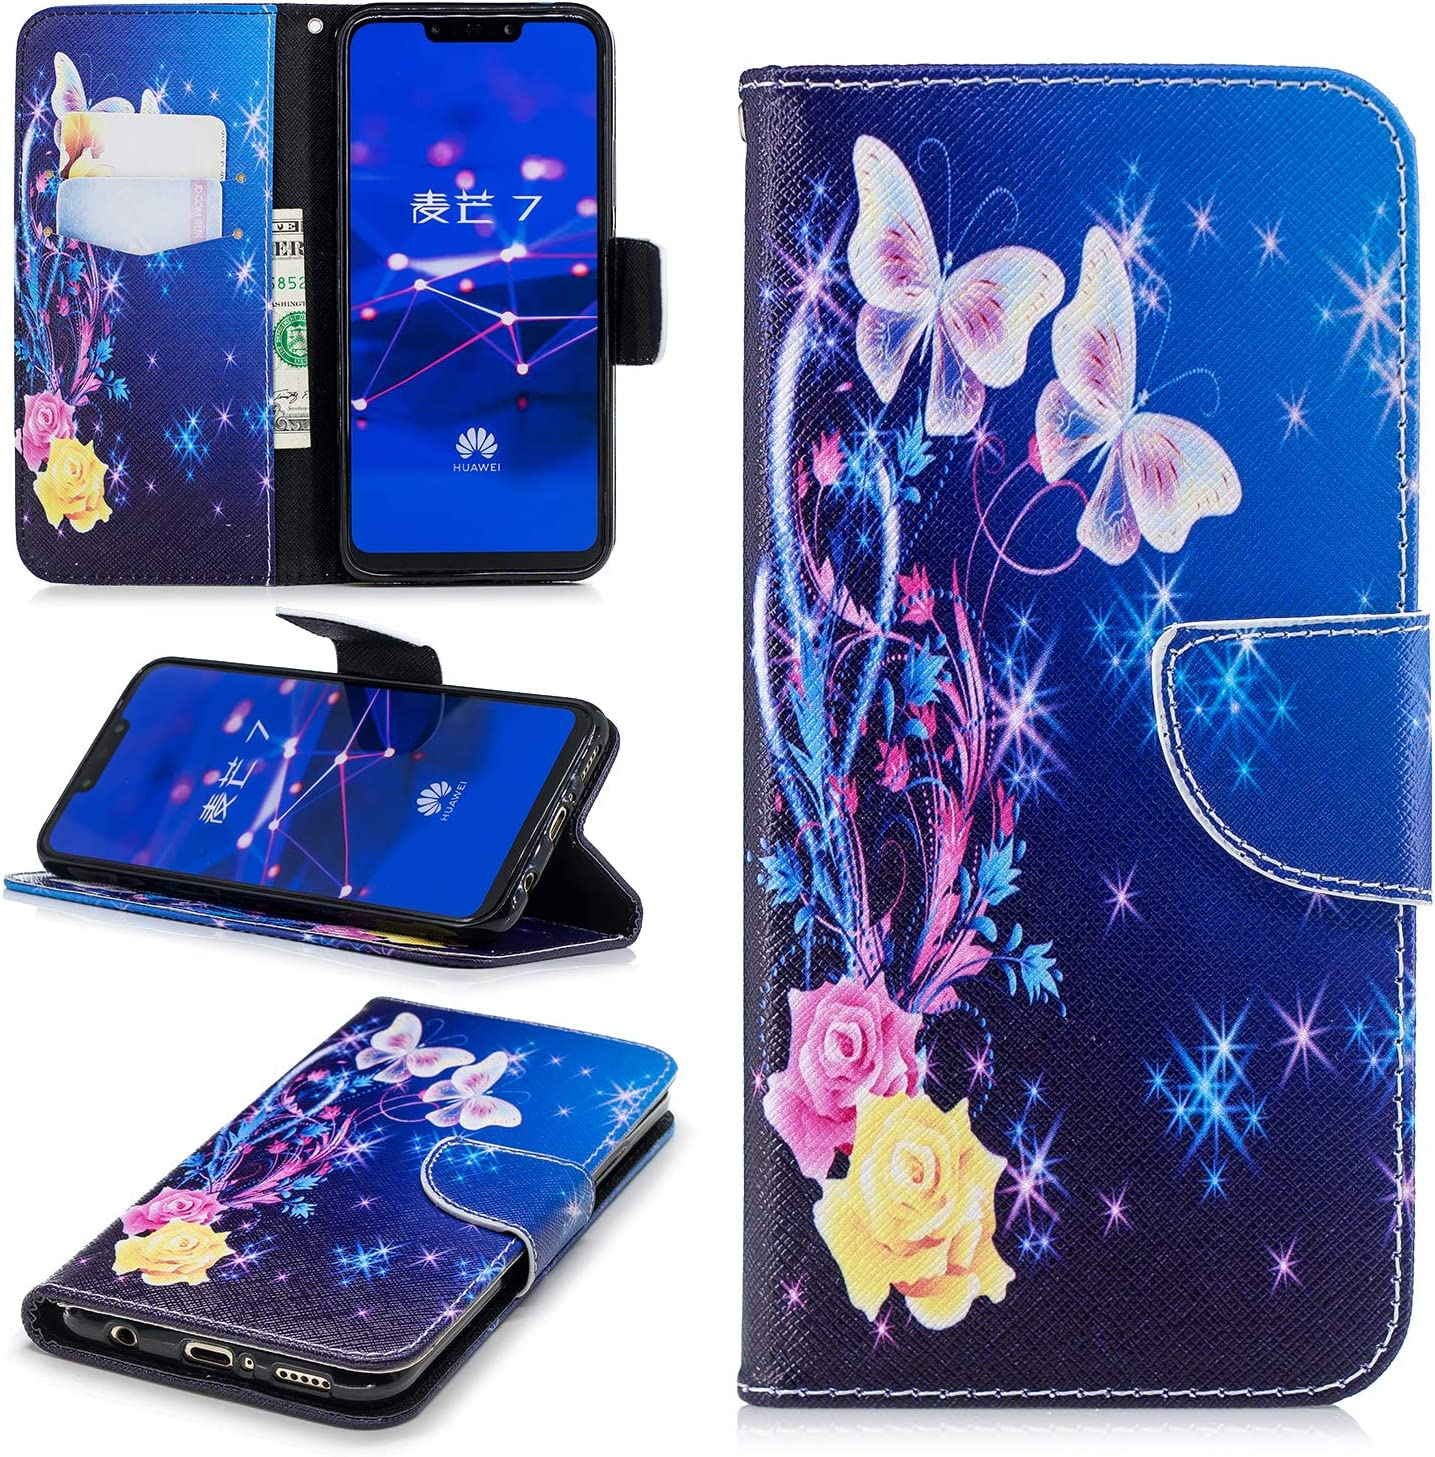 Ostop Brieftasche Leder Hülle Für Huawei Mate 20 Elektronik